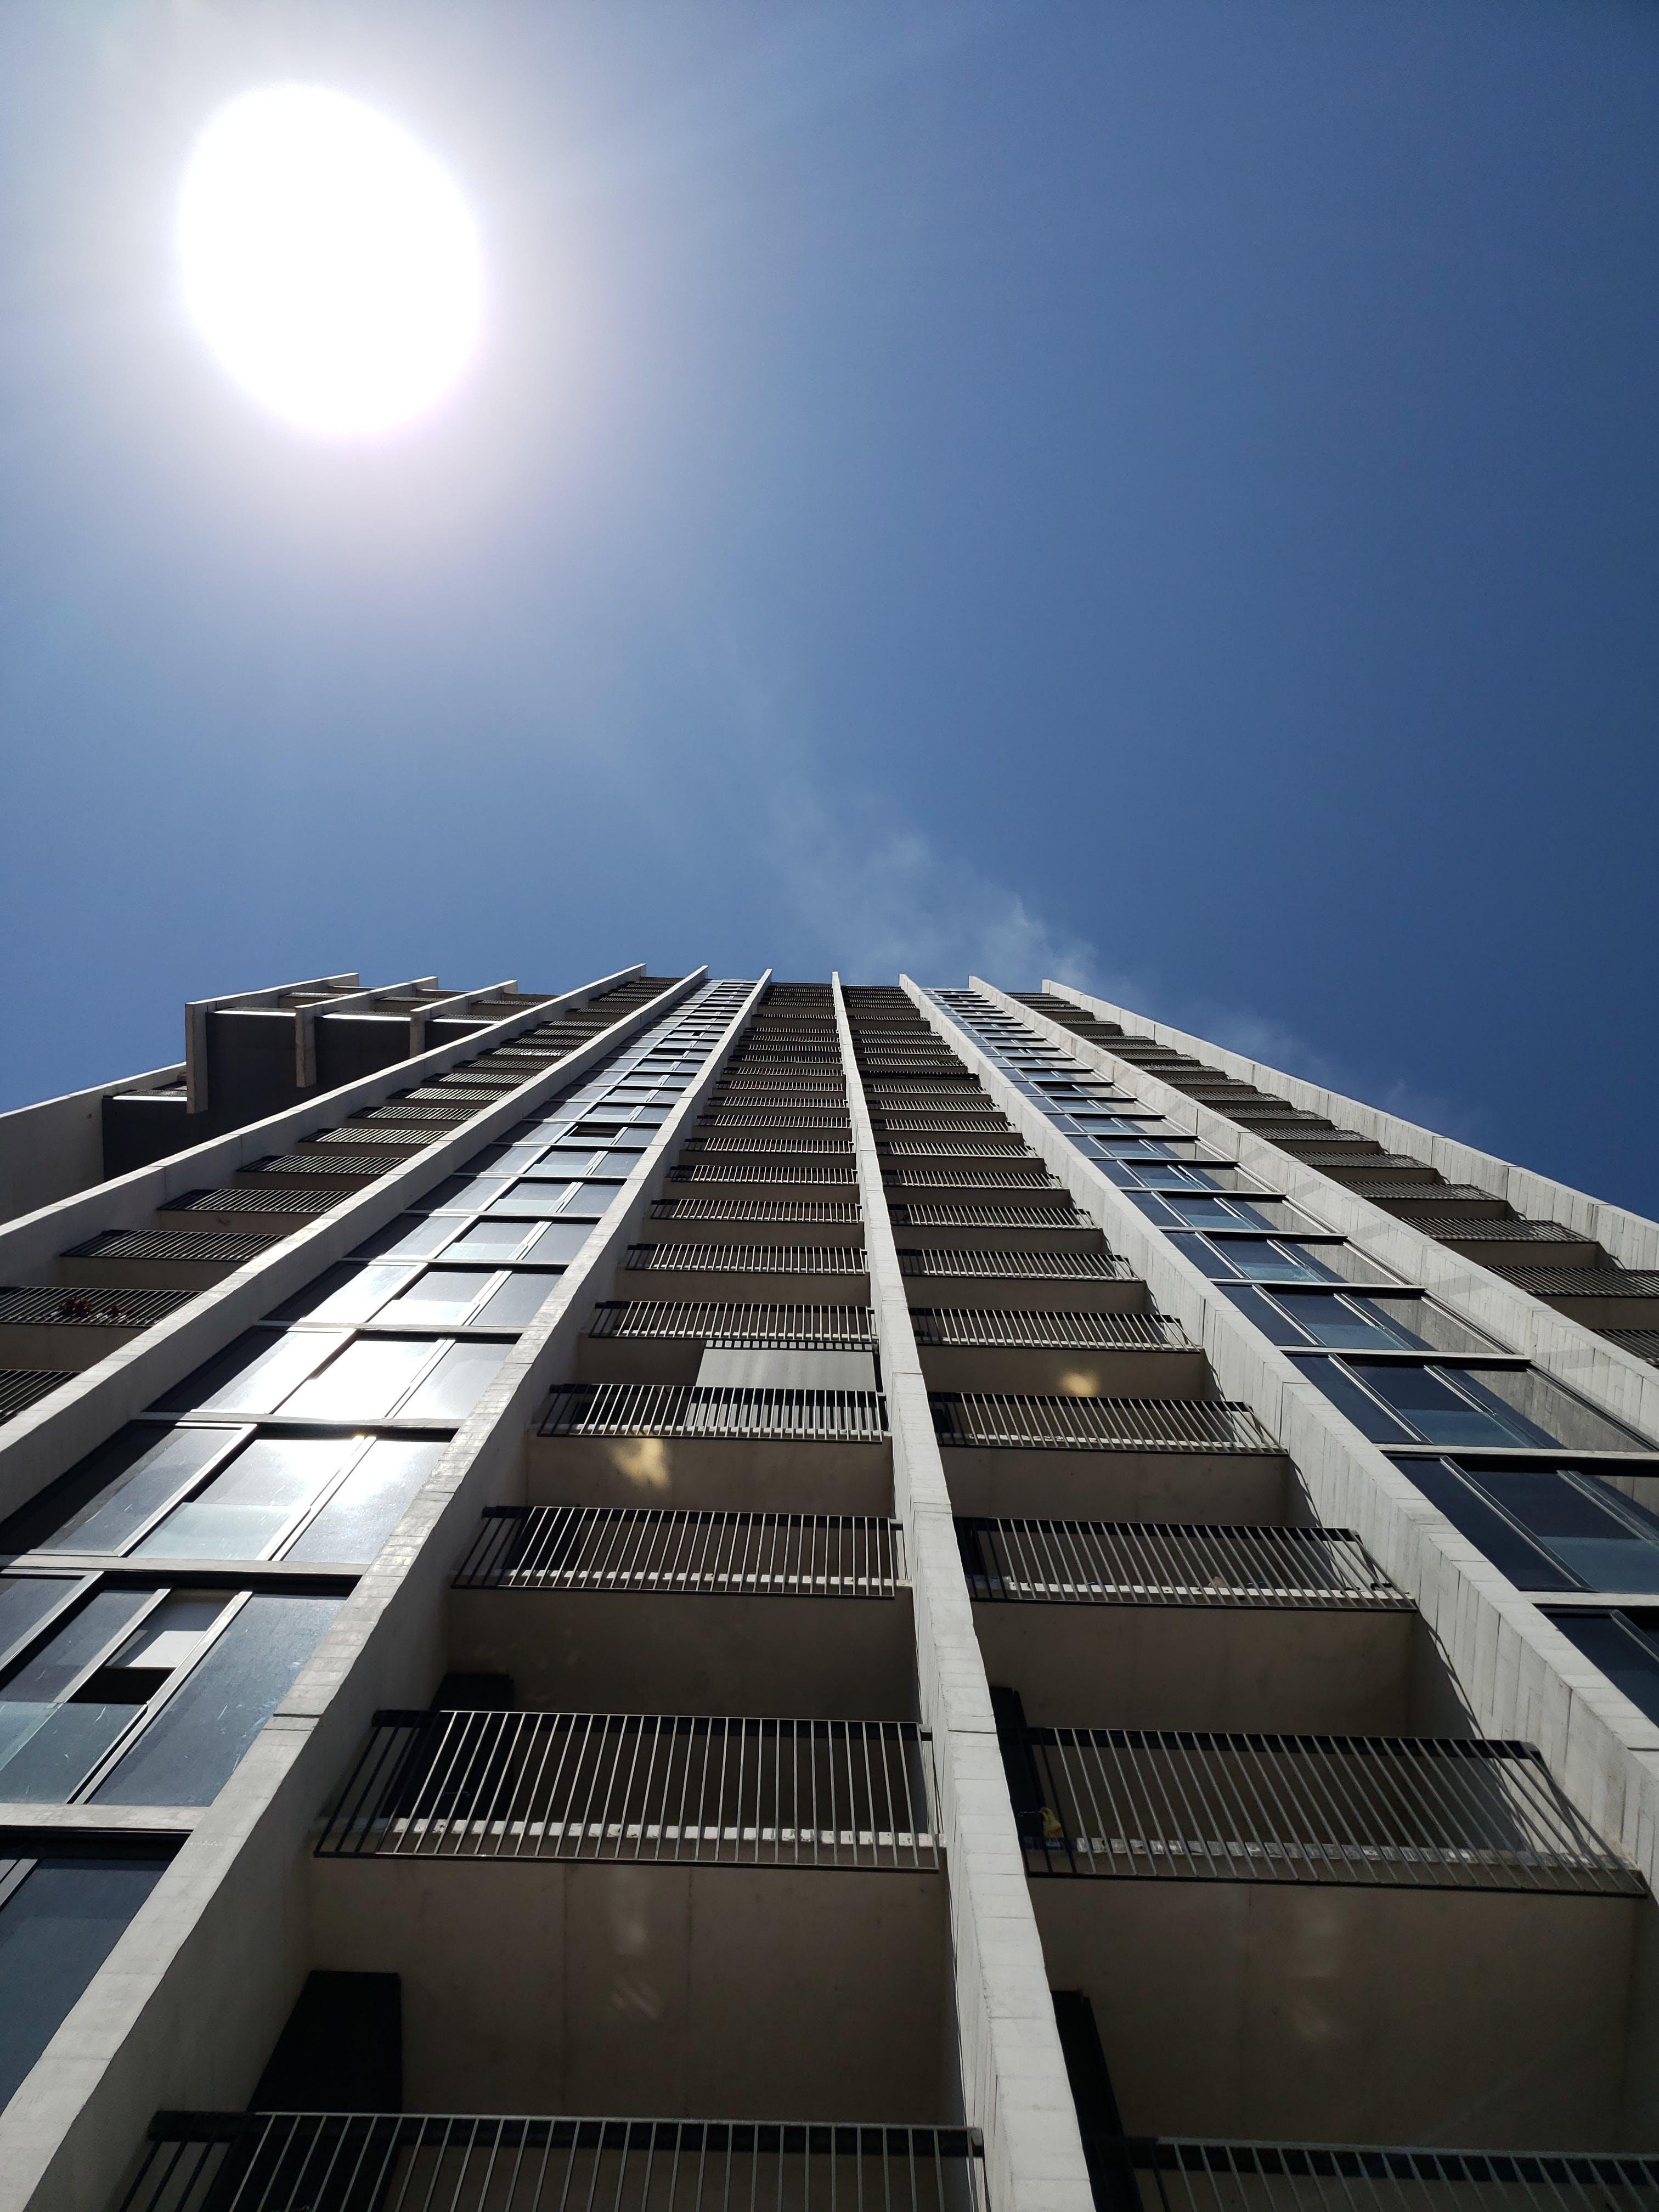 Free stock photo of architecture, building exterior, design, landscape